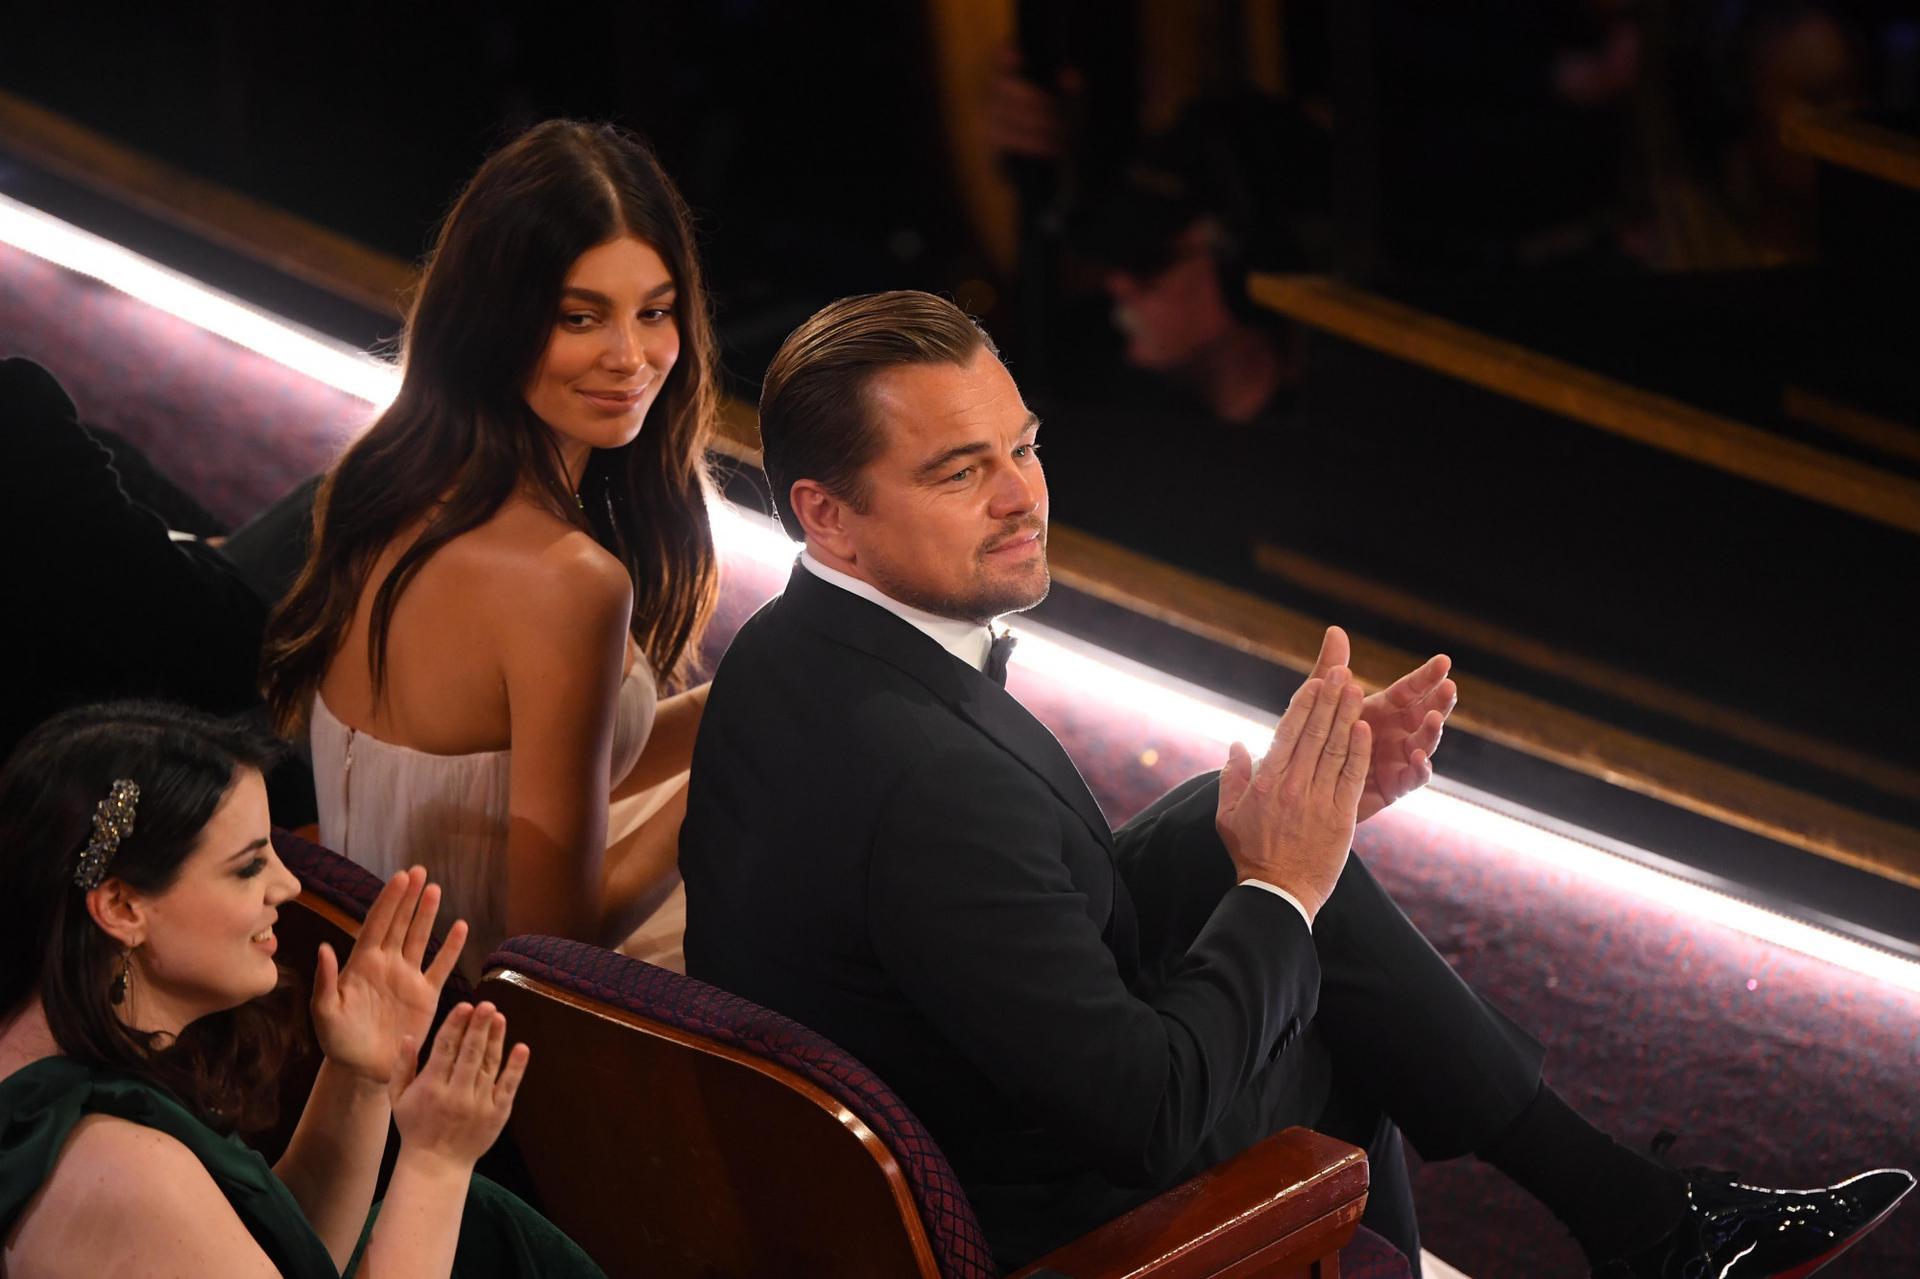 Leonardo DiCaprio i Camila Morrone razem na Oscarach 2020. Szok? I to jaki! - ESKA.pl